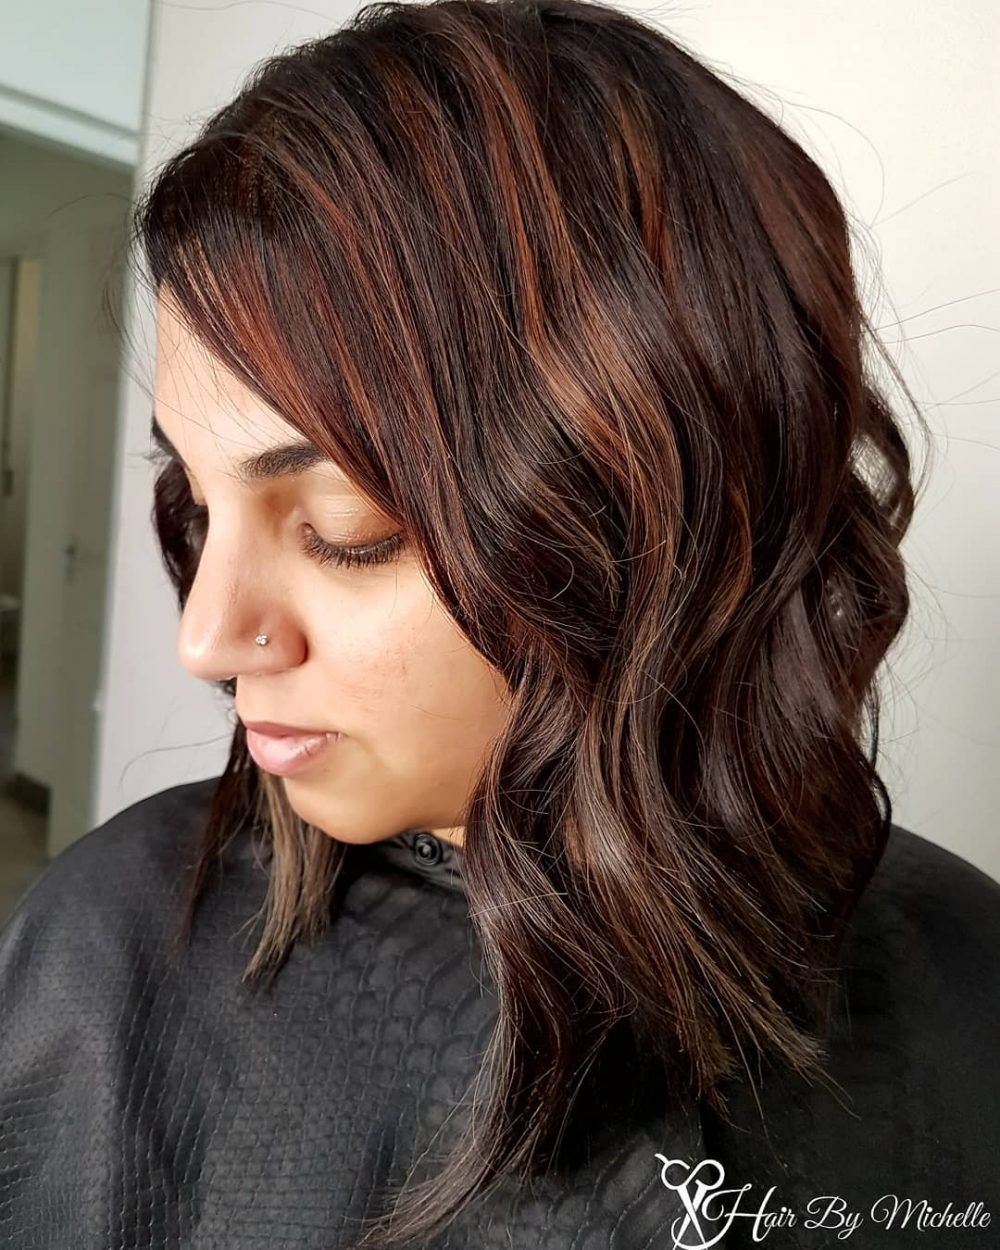 Slightly Asymmetrical Lob hairstyle